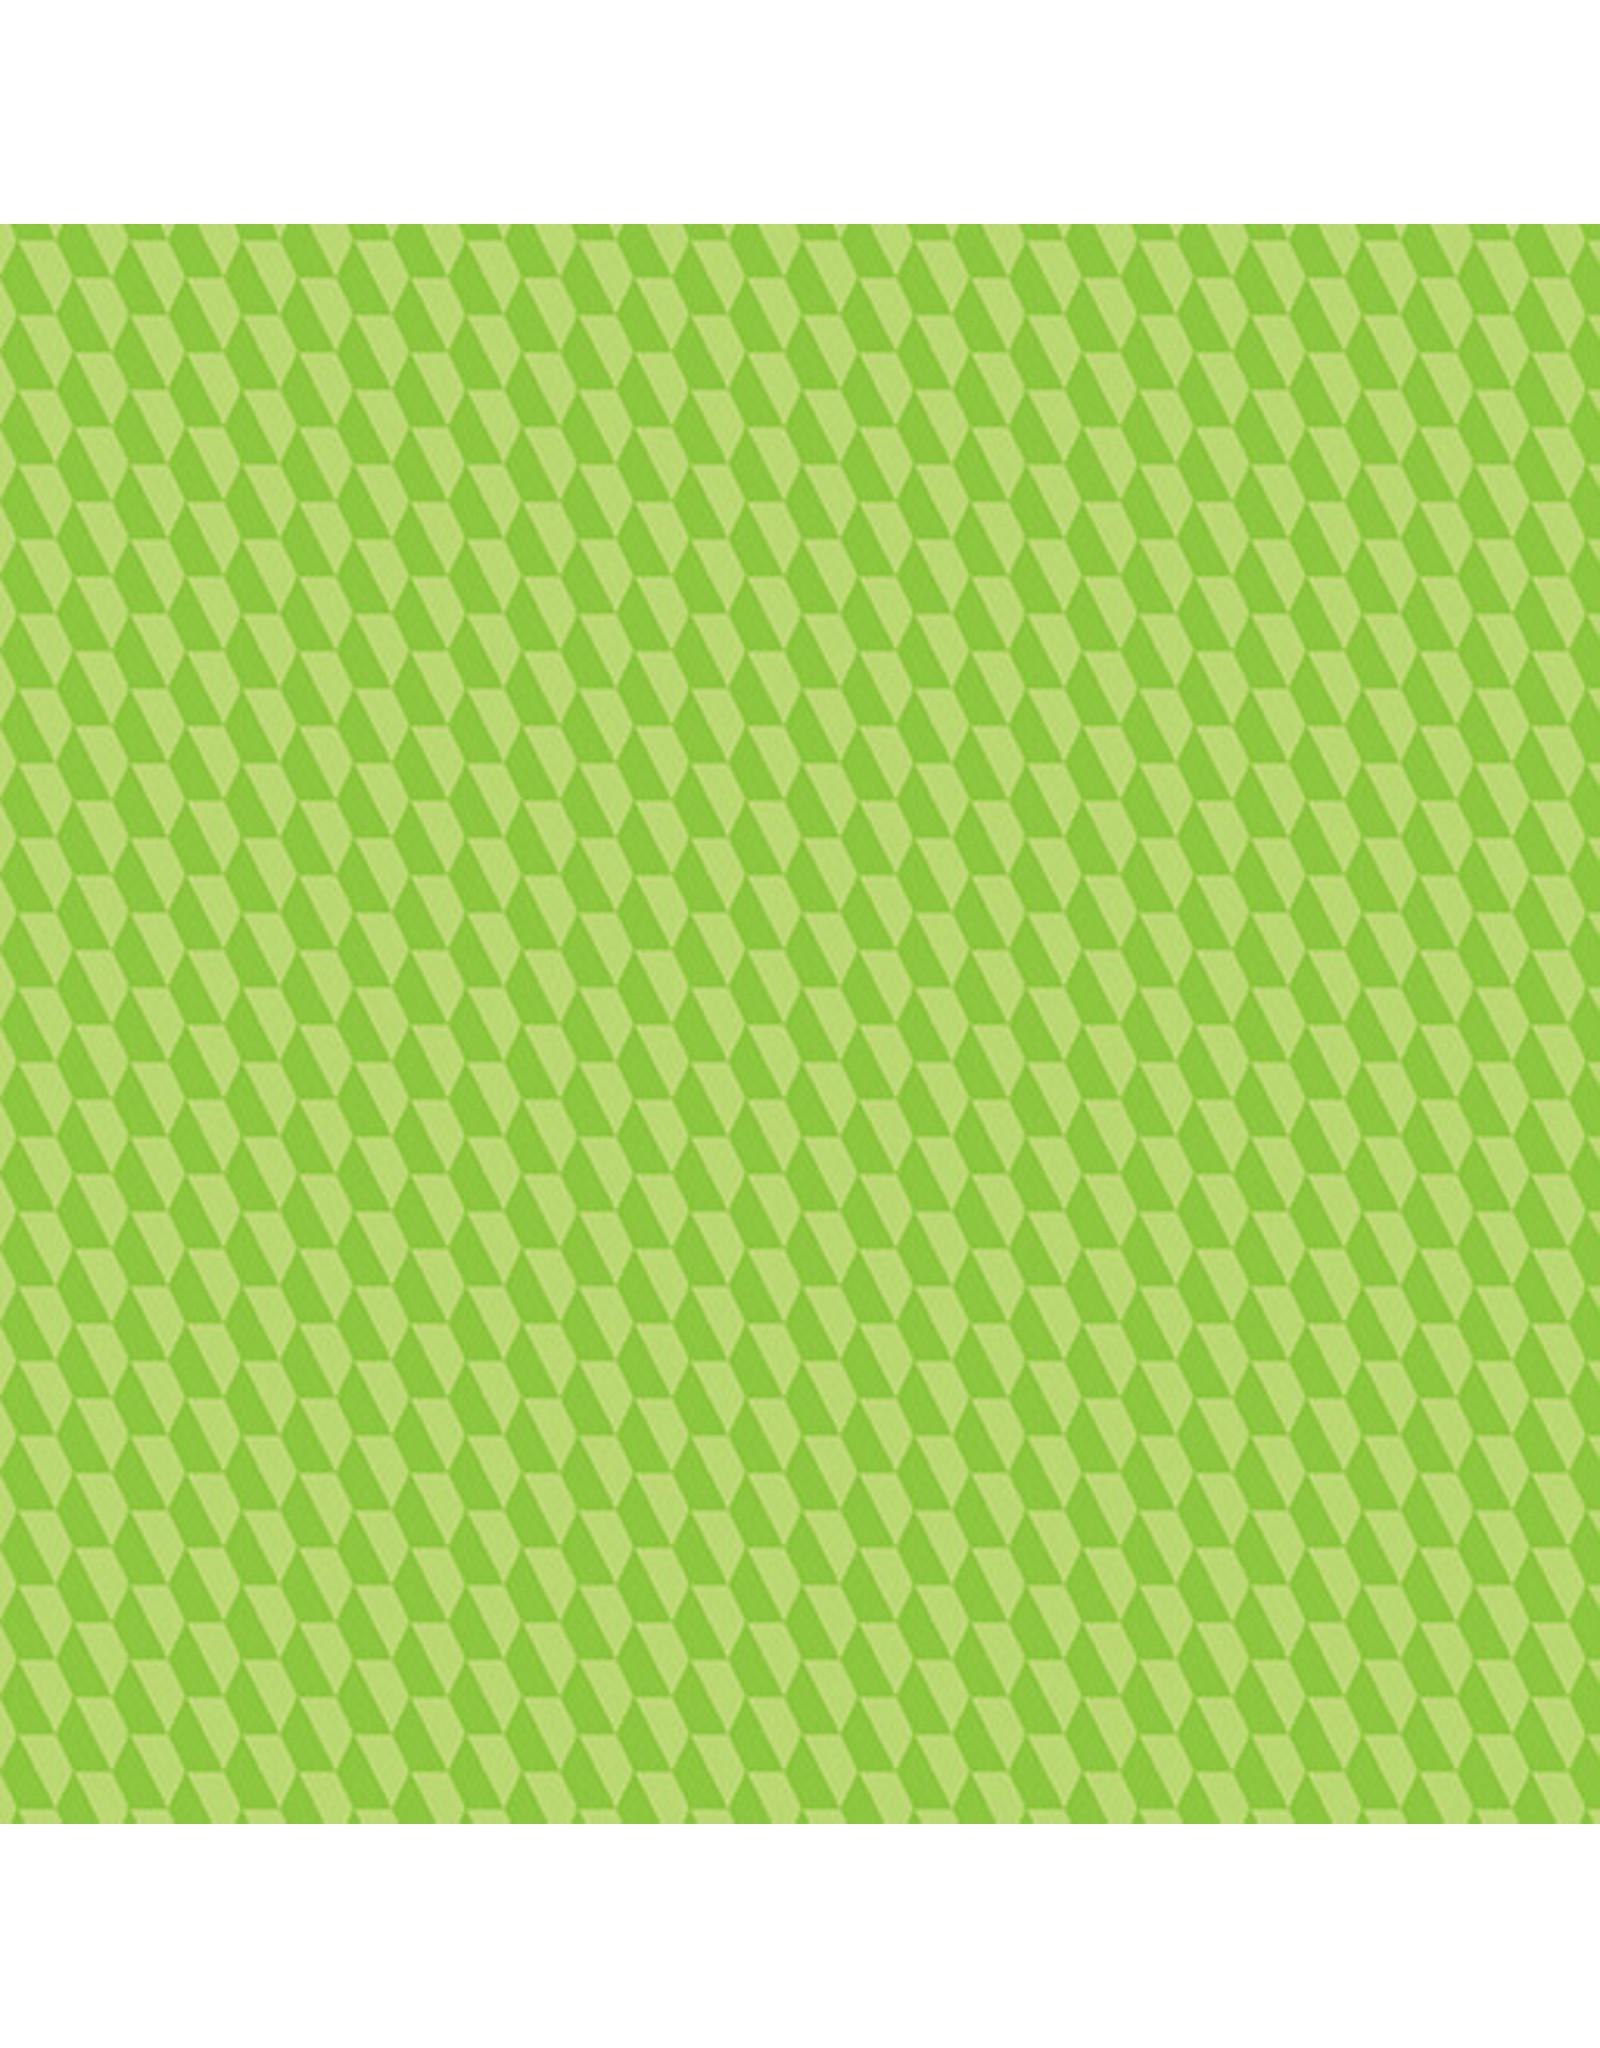 Contempo Geo Pop - Tiny Hex Lime